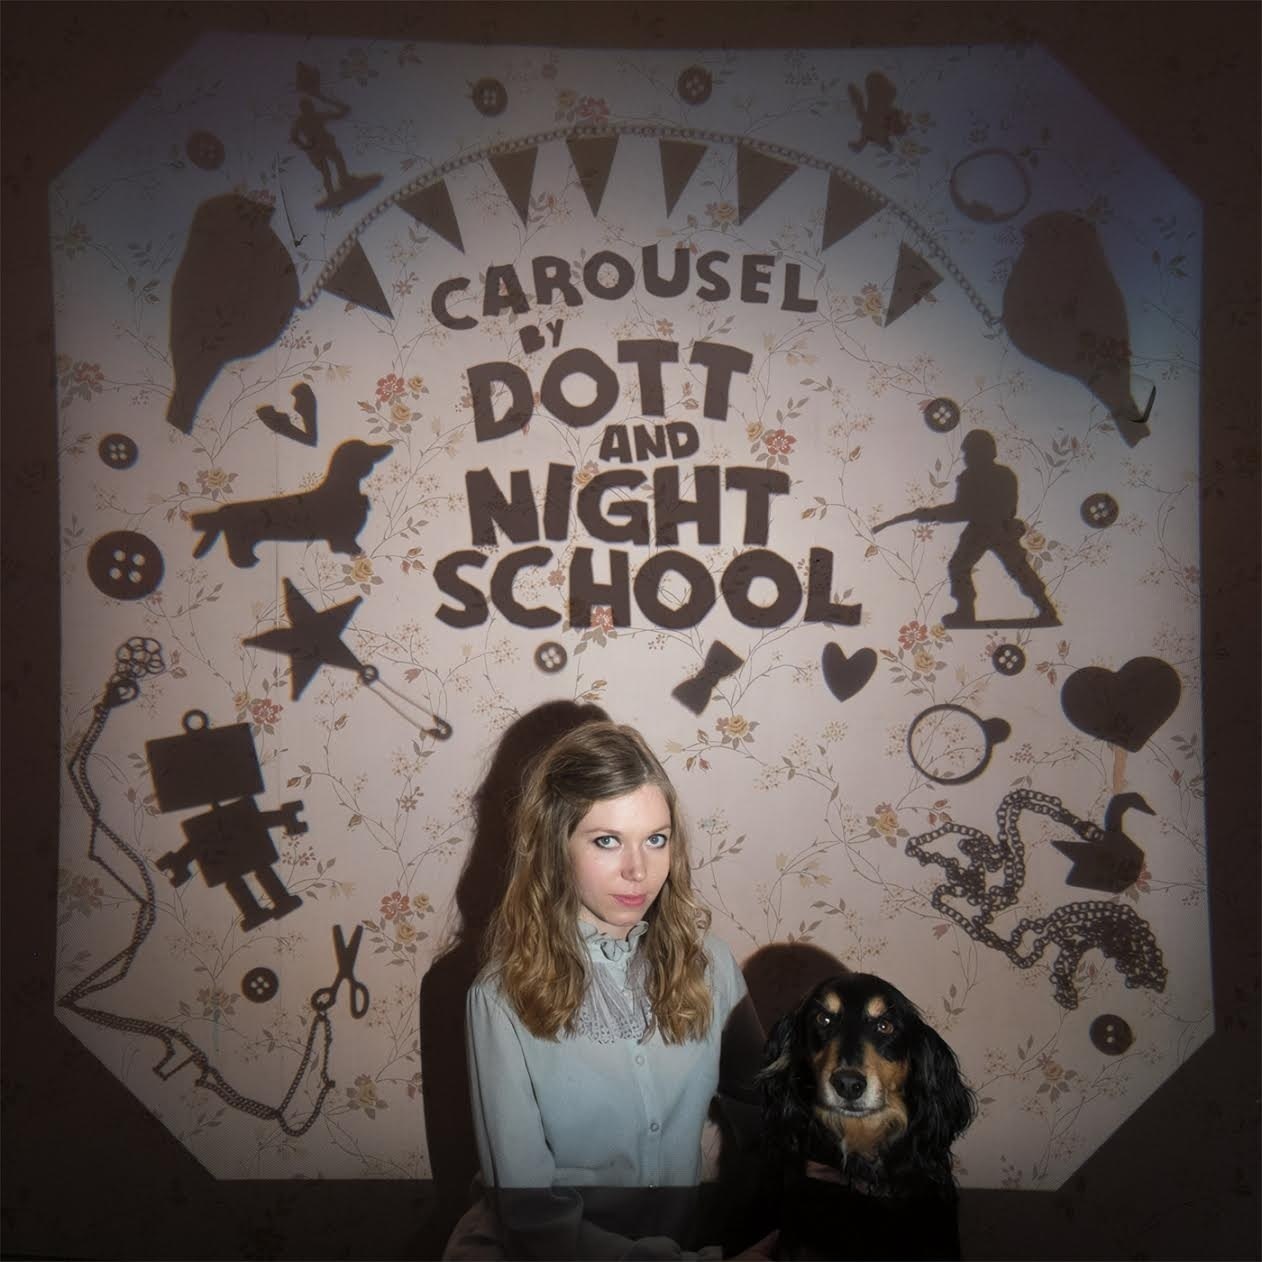 Dott / Night School - Carousel